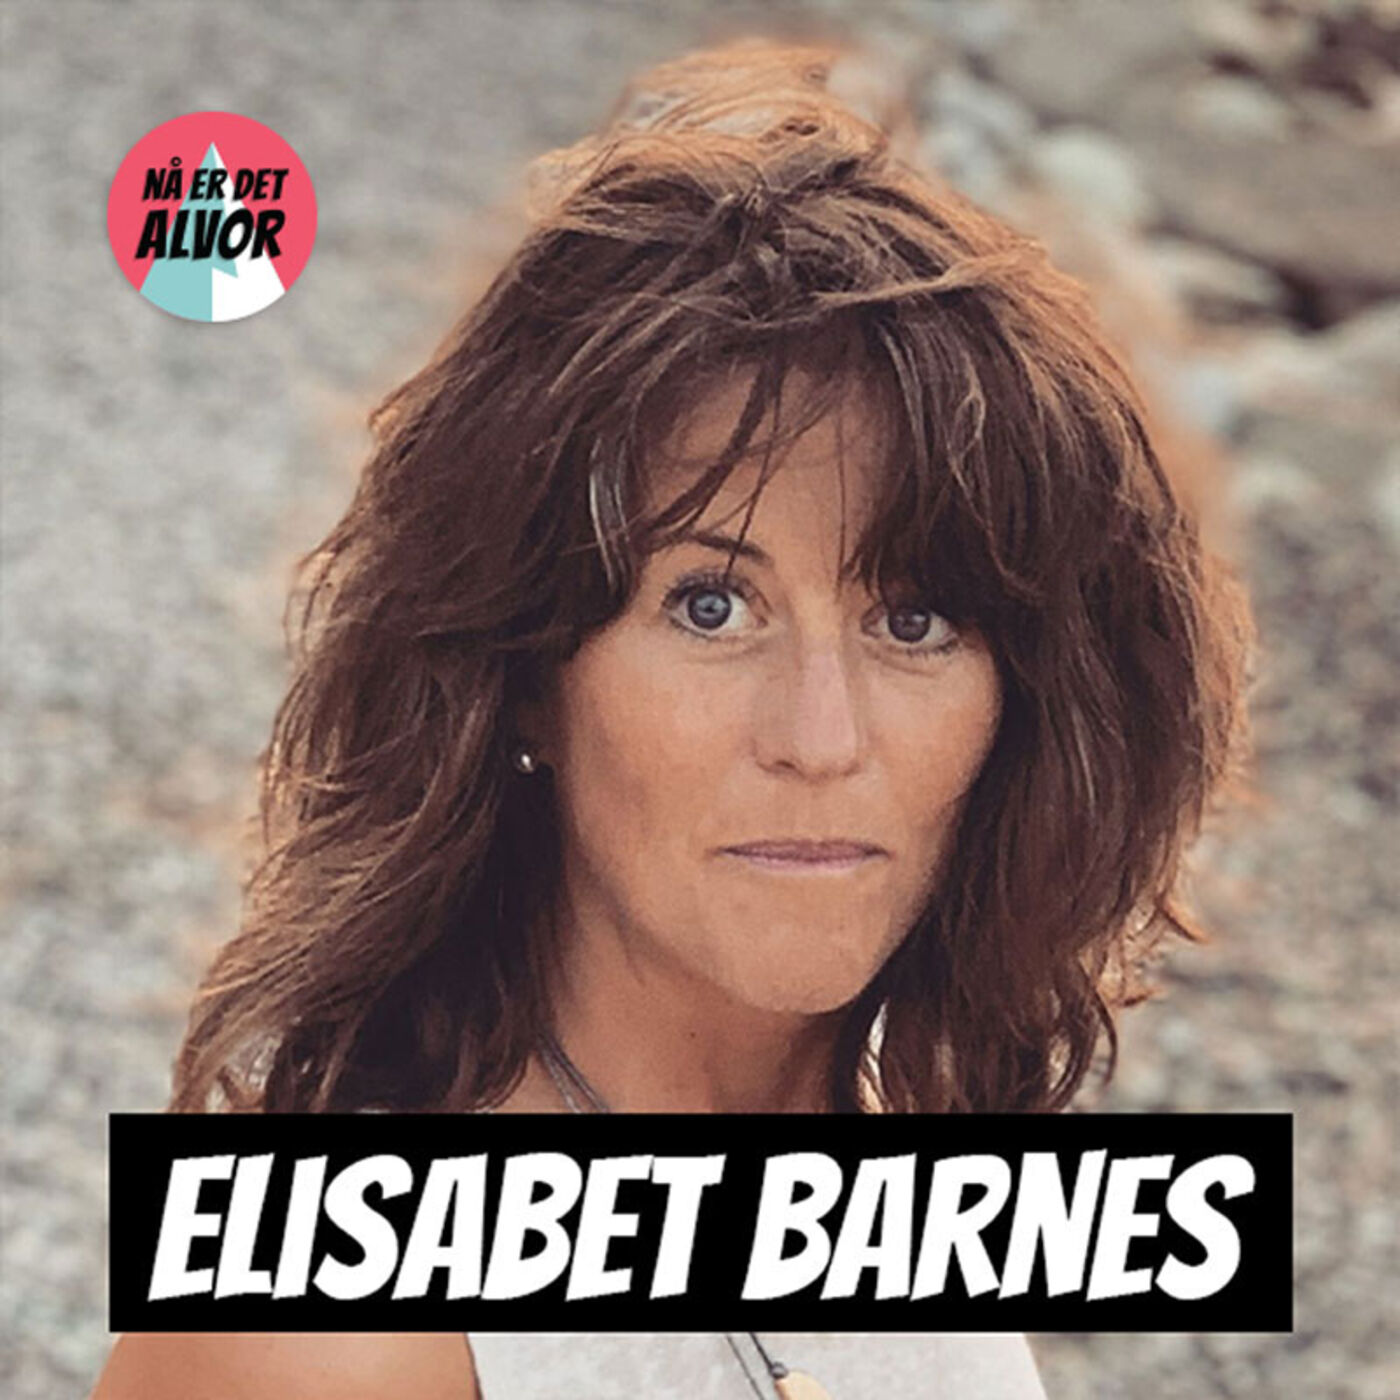 #121 - Elisabet Barnes | Sexterapi, coaching, ultraløping, mensen, RED-S, vegan, etappeløp, Phantasm24, p-piller